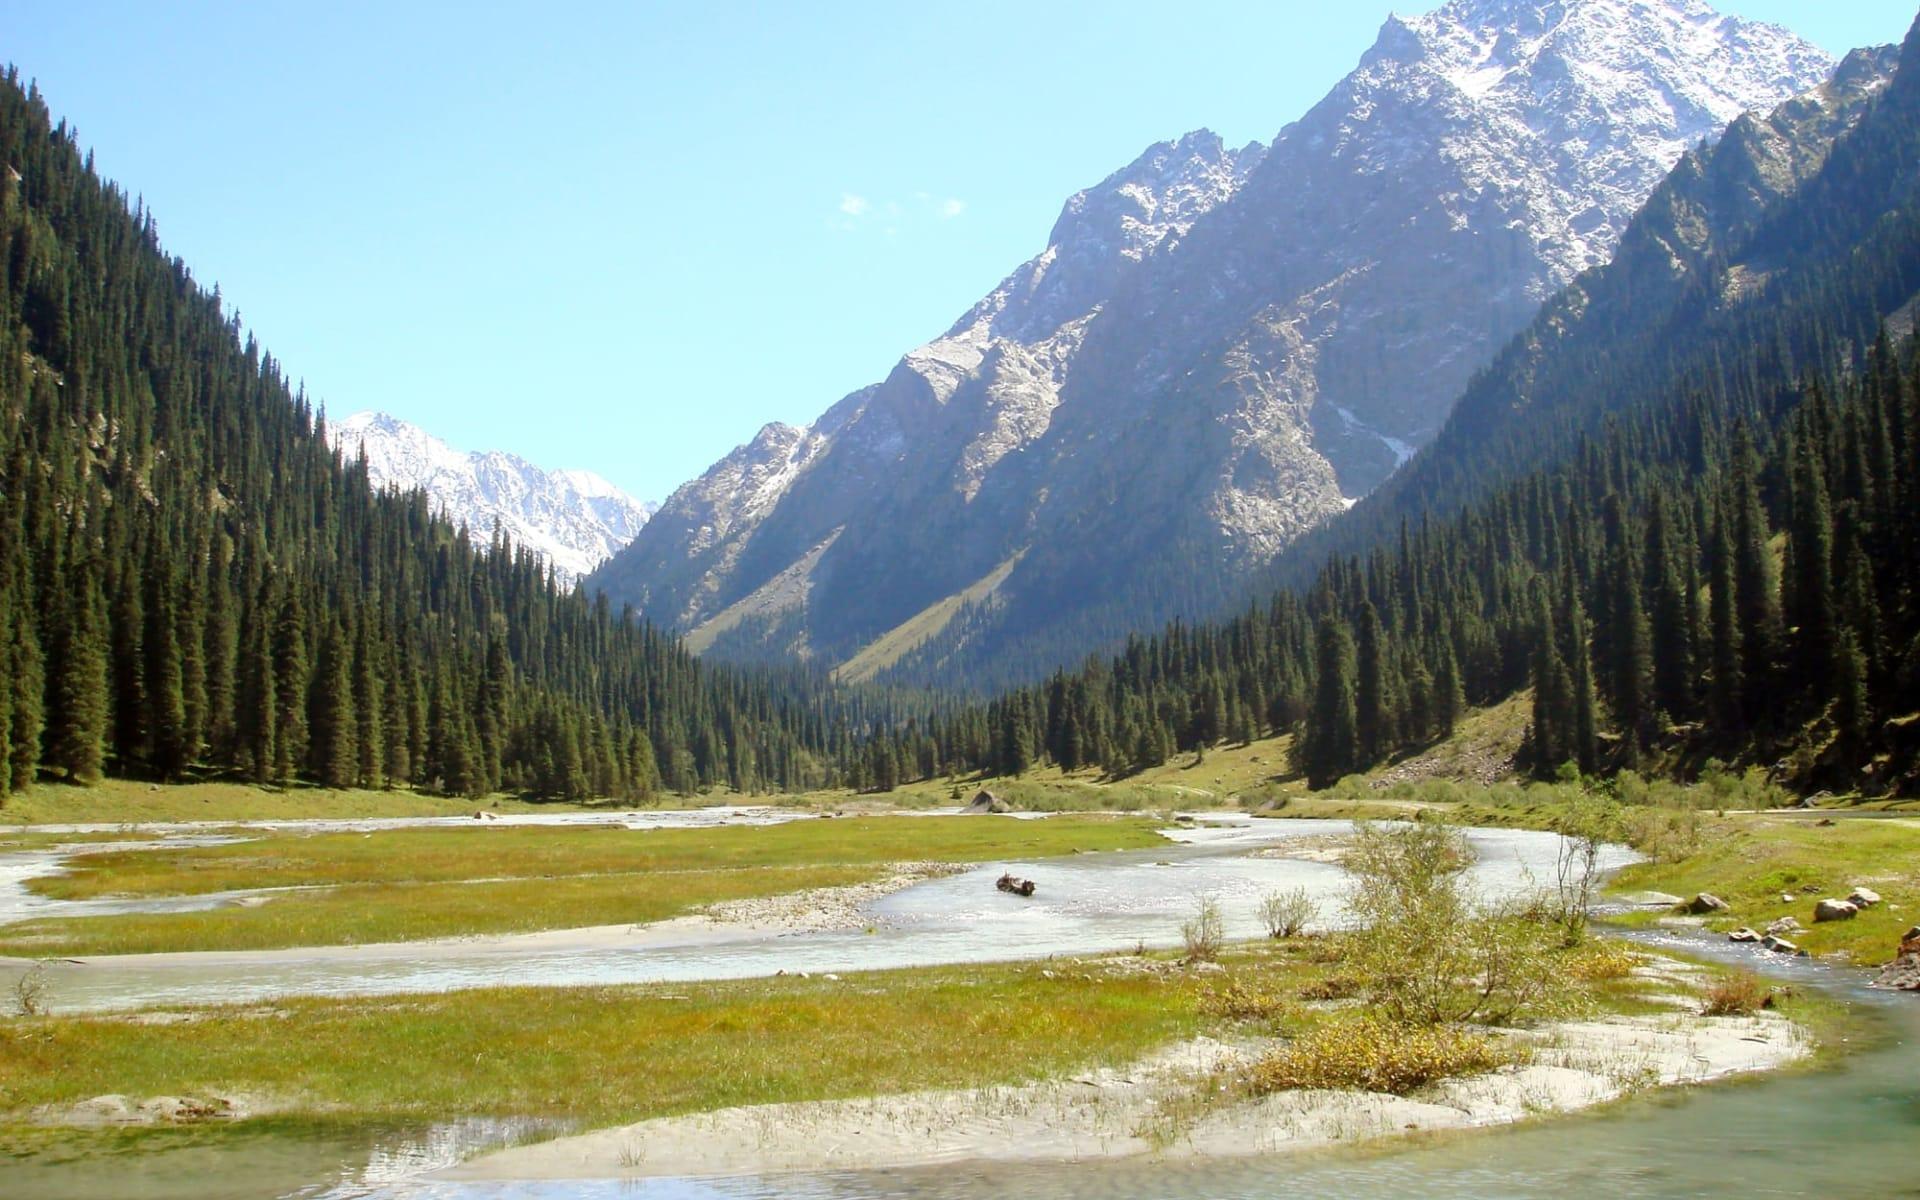 Kasachstan und Kirgistan kompakt ab Almaty: Kirgistan - Landschaft